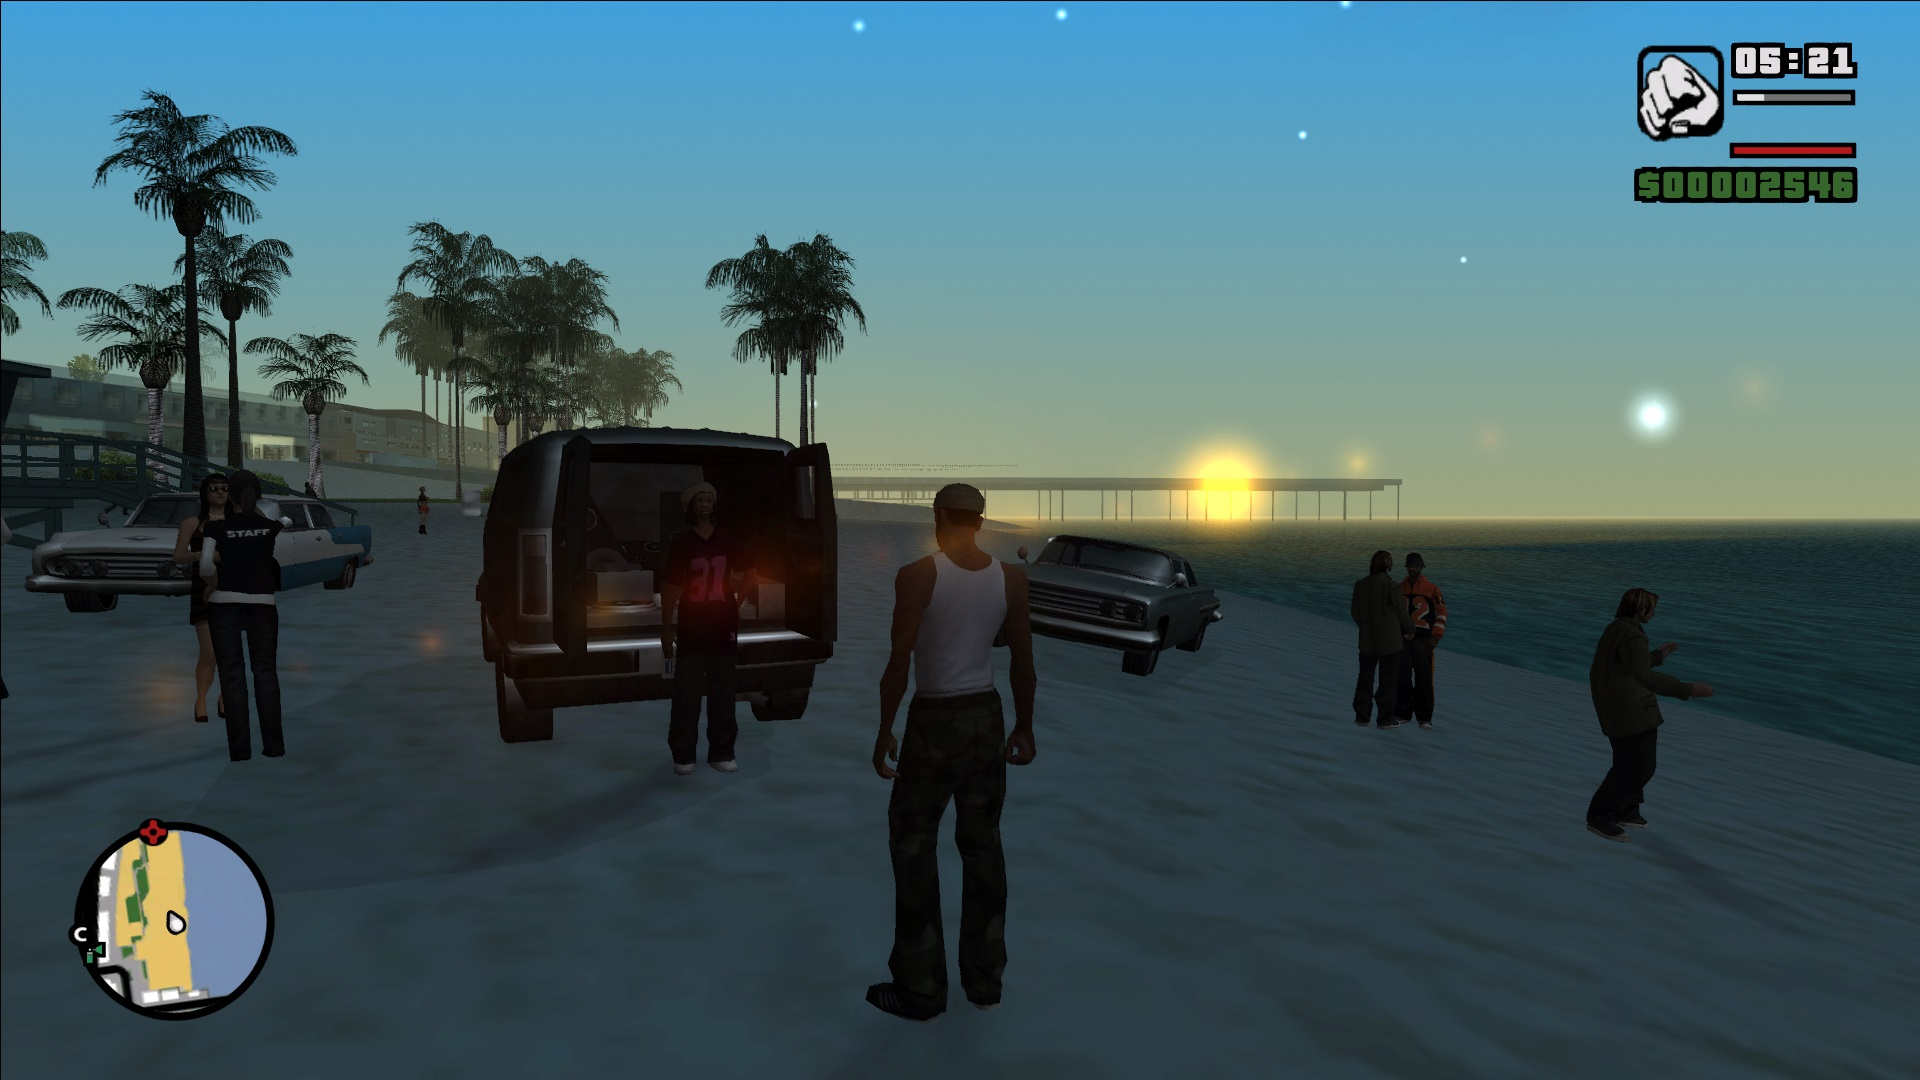 GTA San Andreas (mod - full screen and PS2 sun bloor) - Grand Theft Auto: San Andreas PS2, Моды